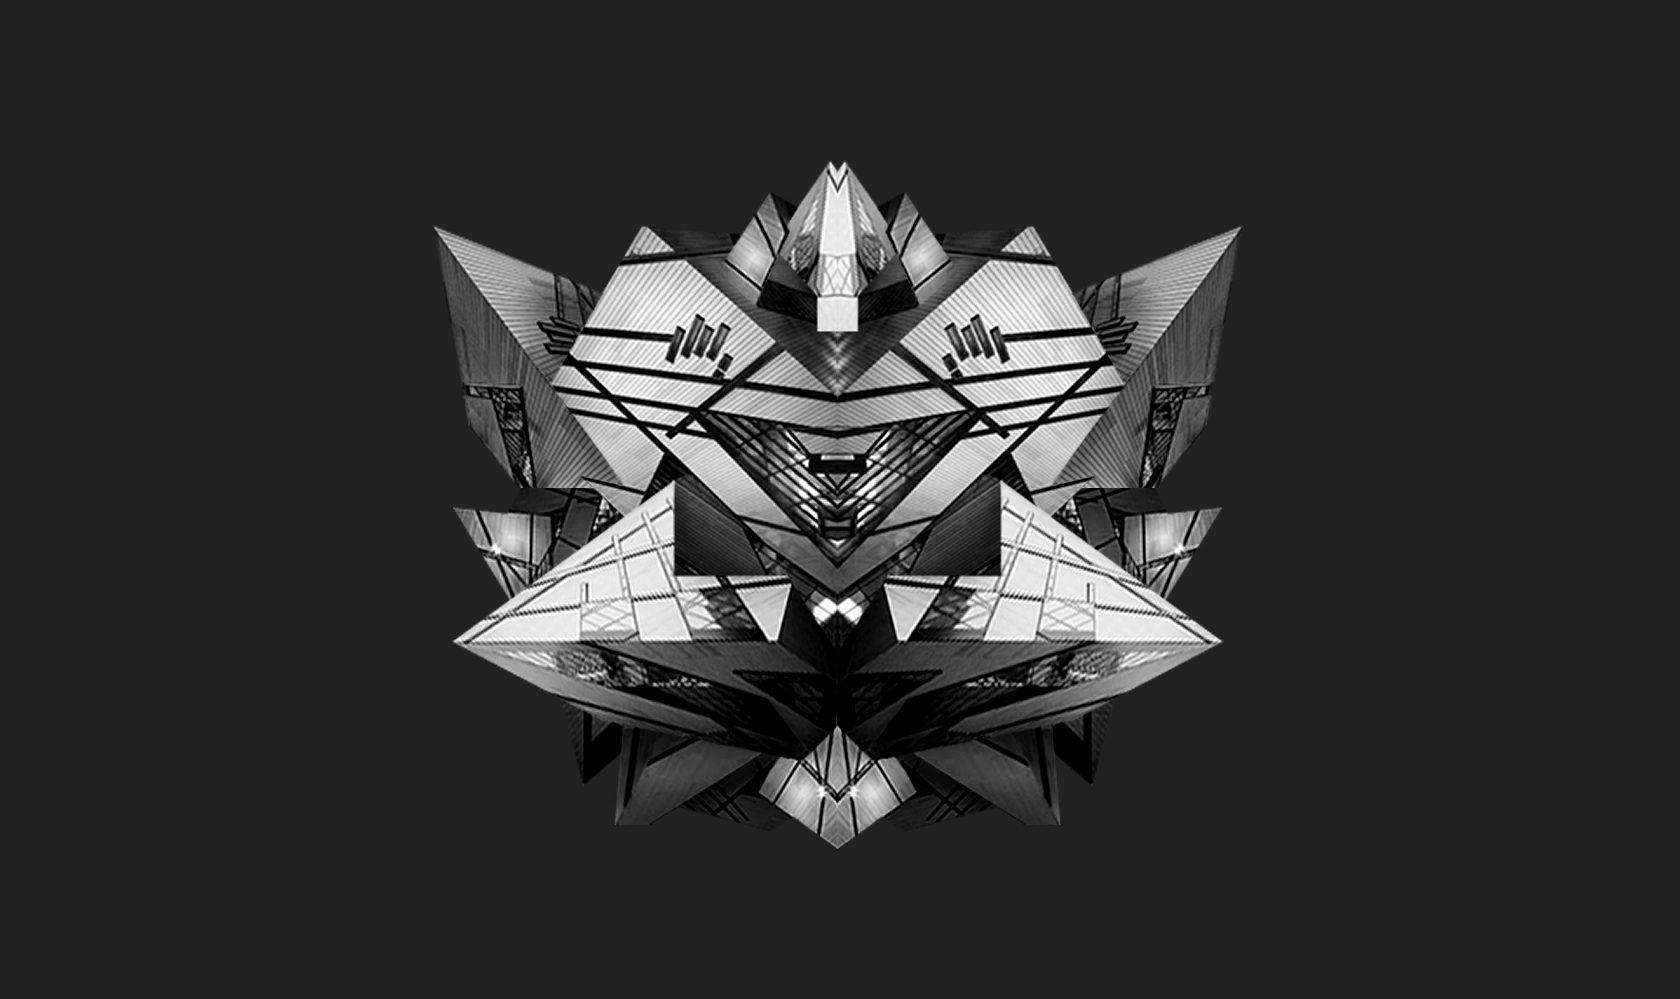 The Visual Medium Graphic Design by Furia